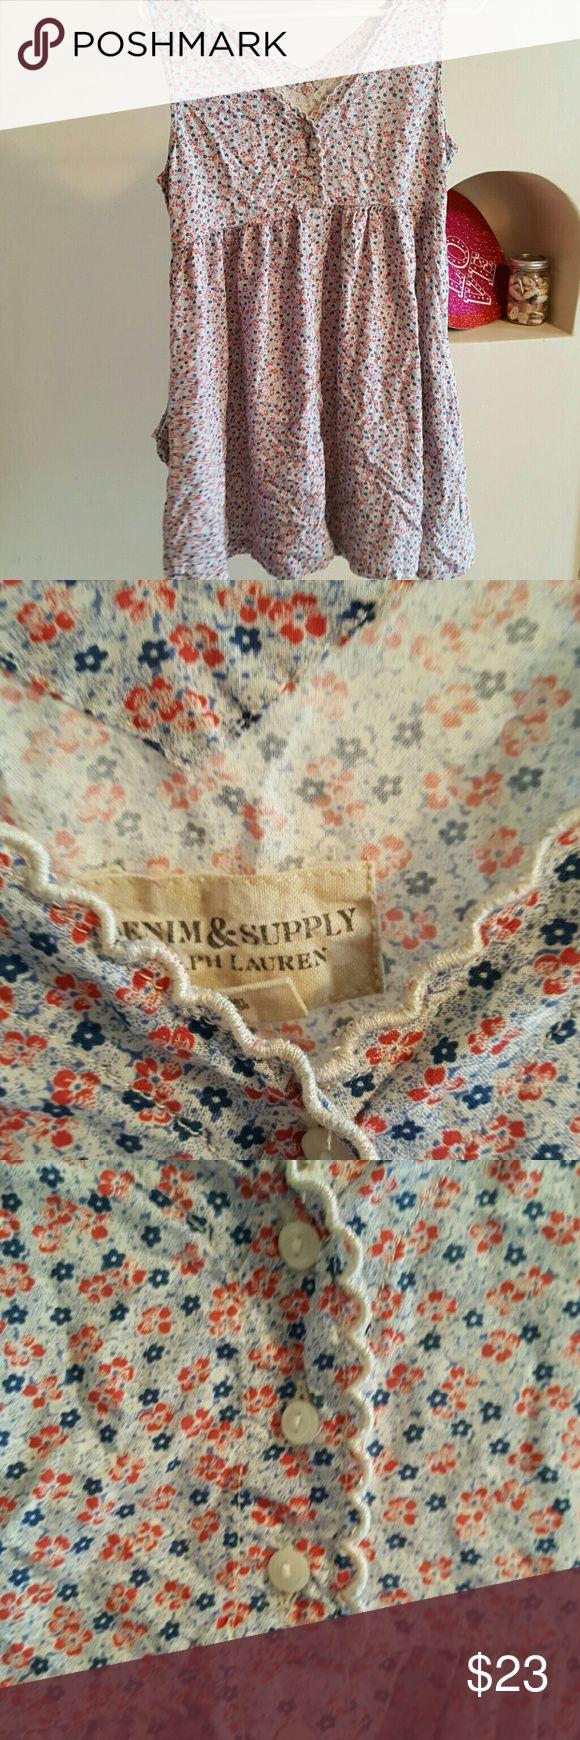 Sun dress with pockets Ralph Lauren Floral Excellent condition. Demin Supply co. By Ralph lauren. Size medium. Ralph Lauren Dresses